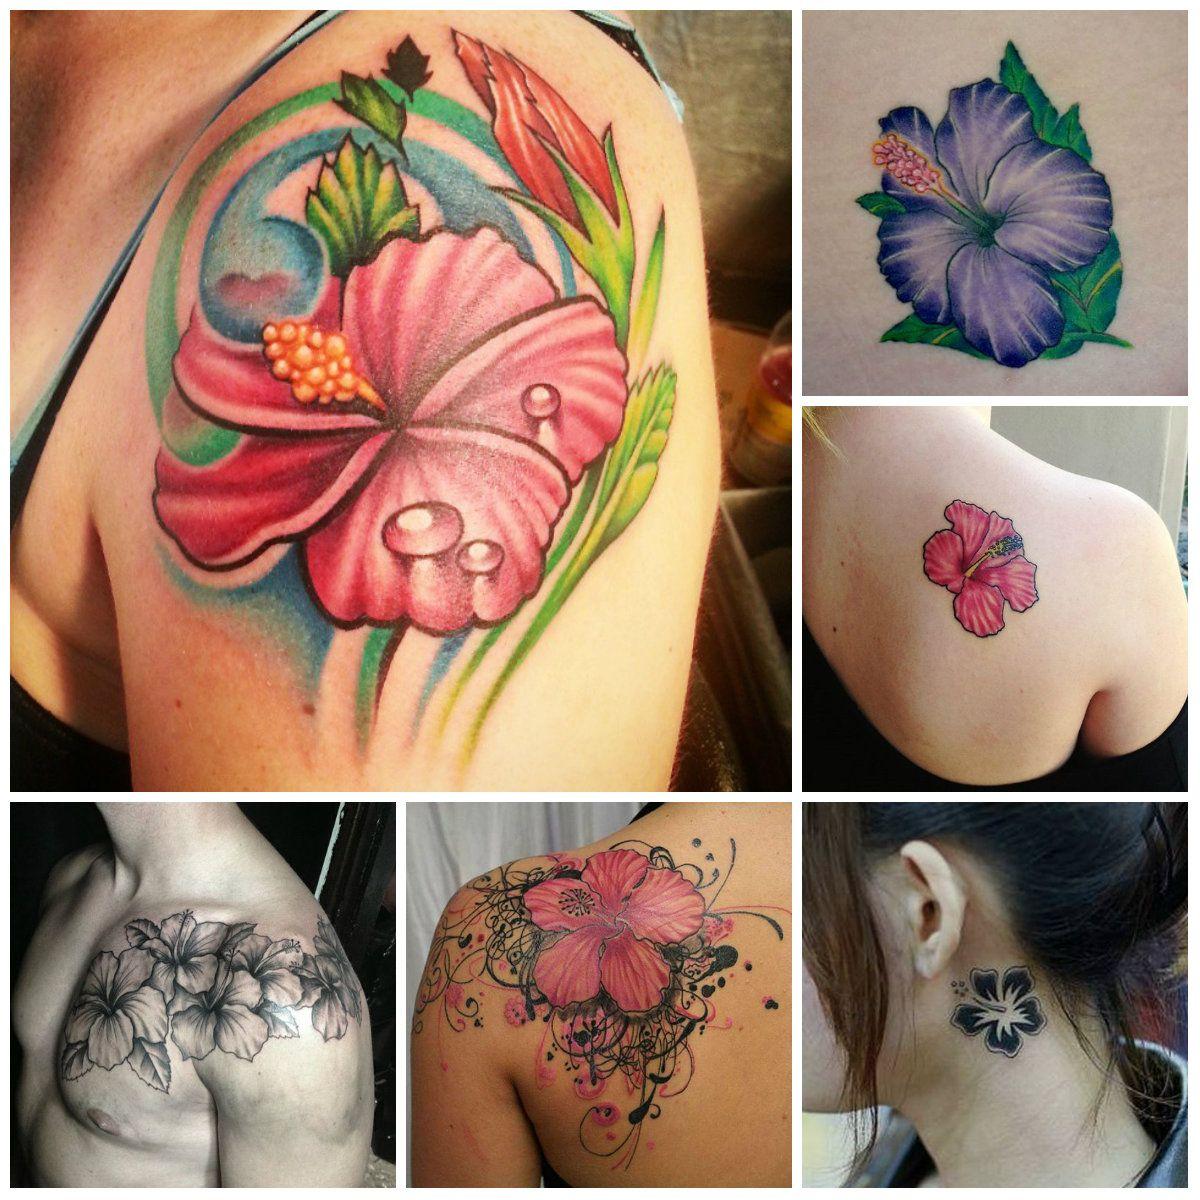 Flower tattoos fashion pinterest flower tattoos hibiscus flower tattoos izmirmasajfo